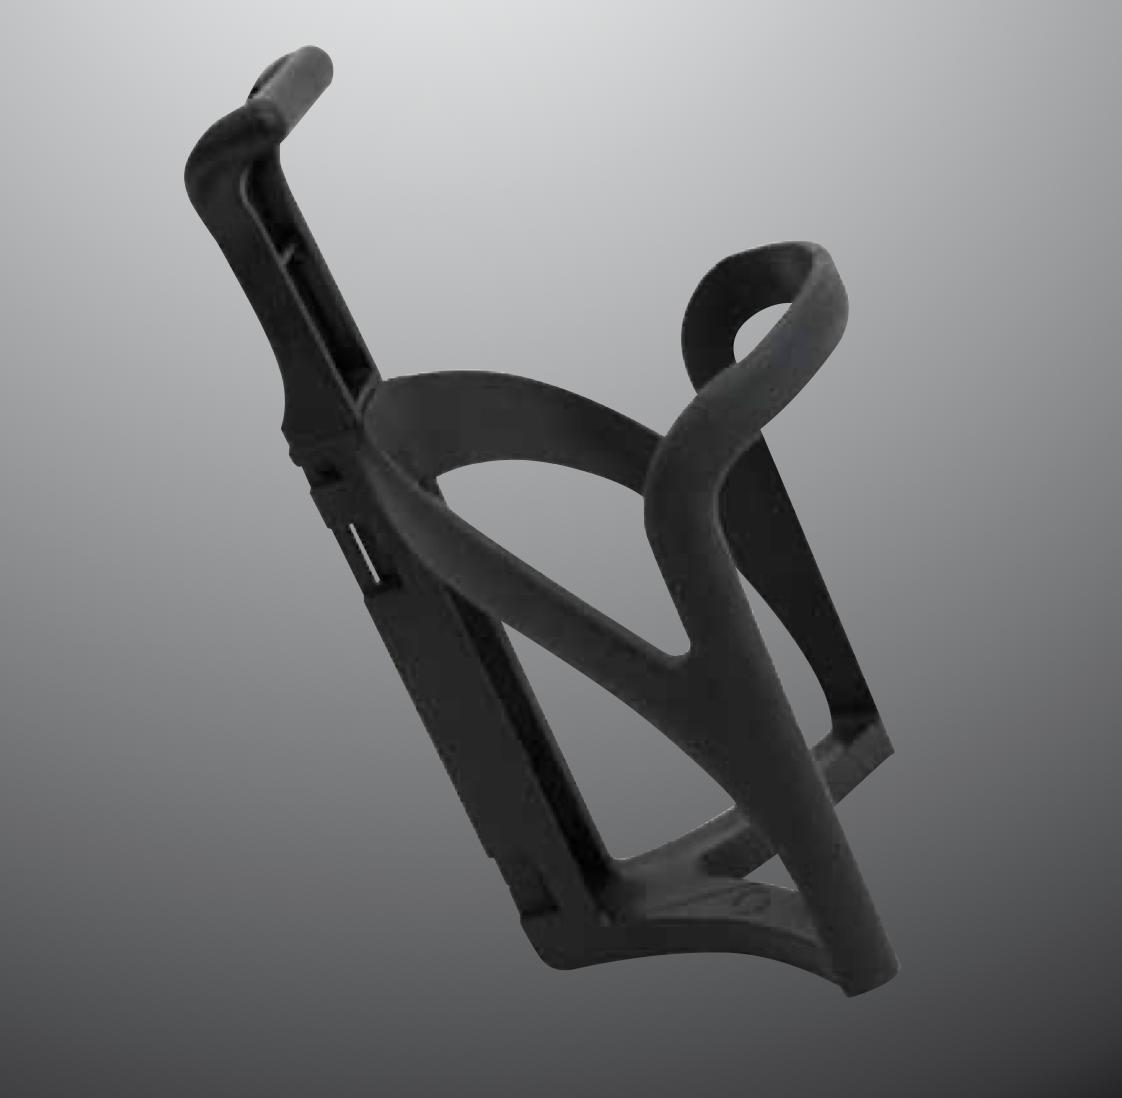 Porte bidon composite comp-1